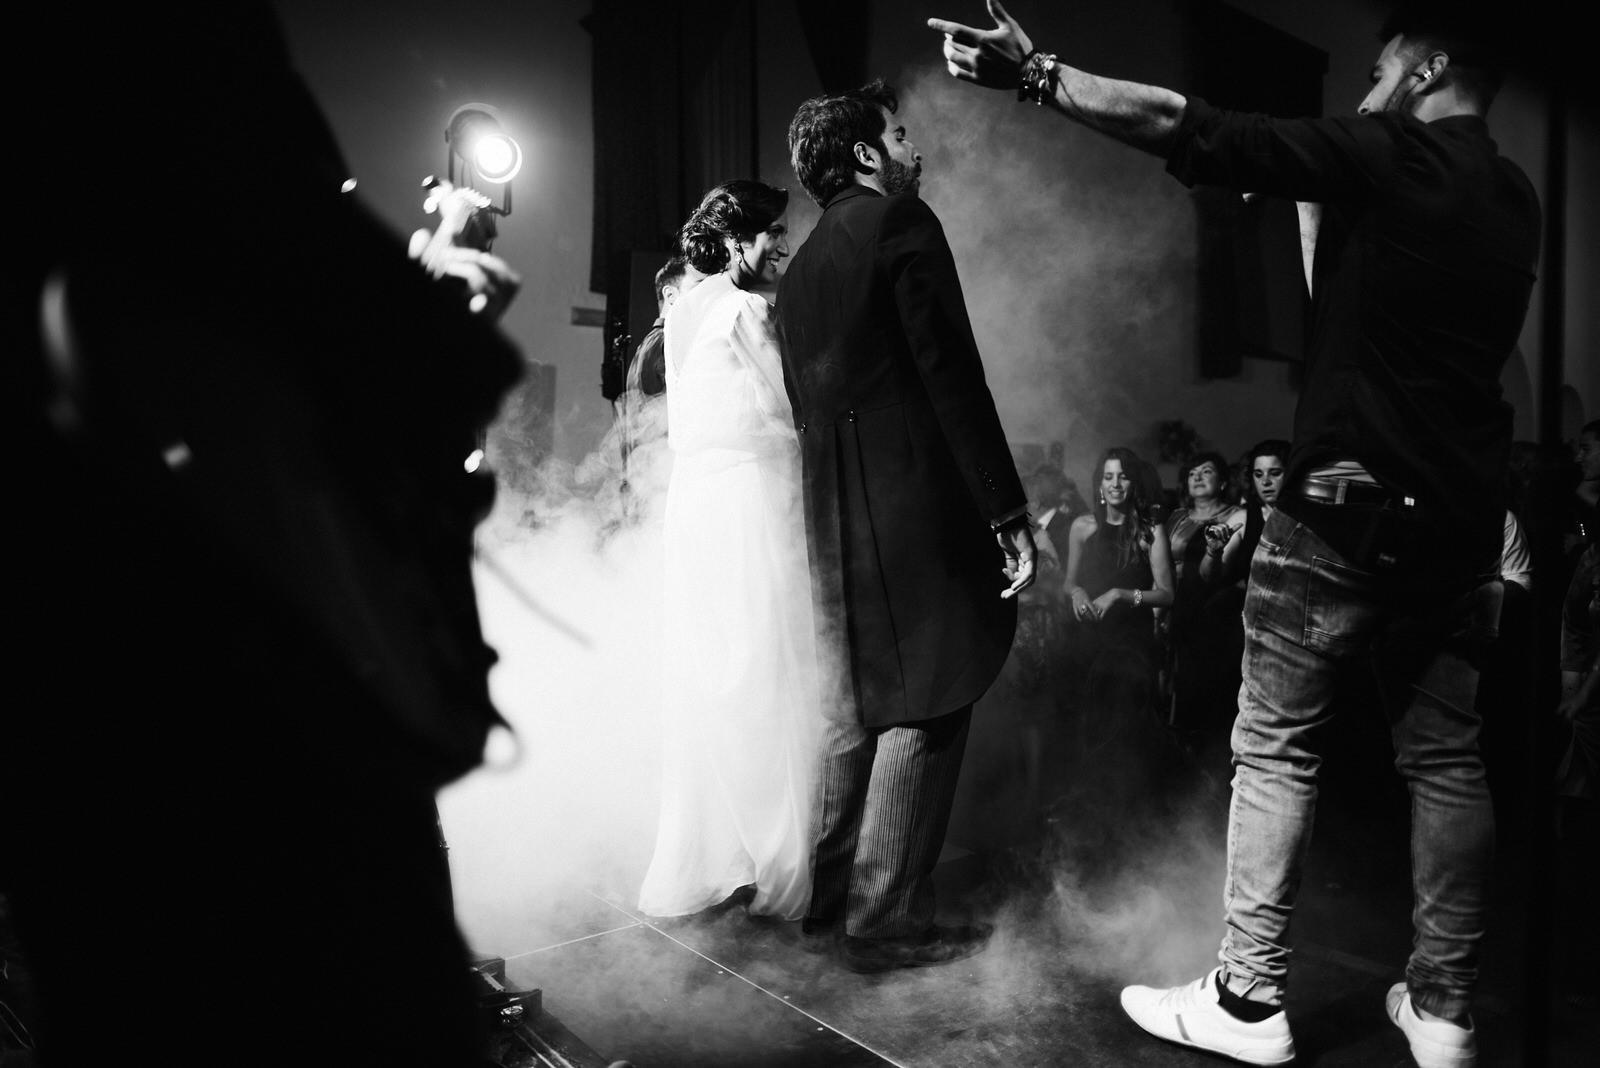 fotografo de bodas sevilla - fotografo boda - fotografía sevilla - Andrés AmarilloAAA_3945-2- fine.JPG